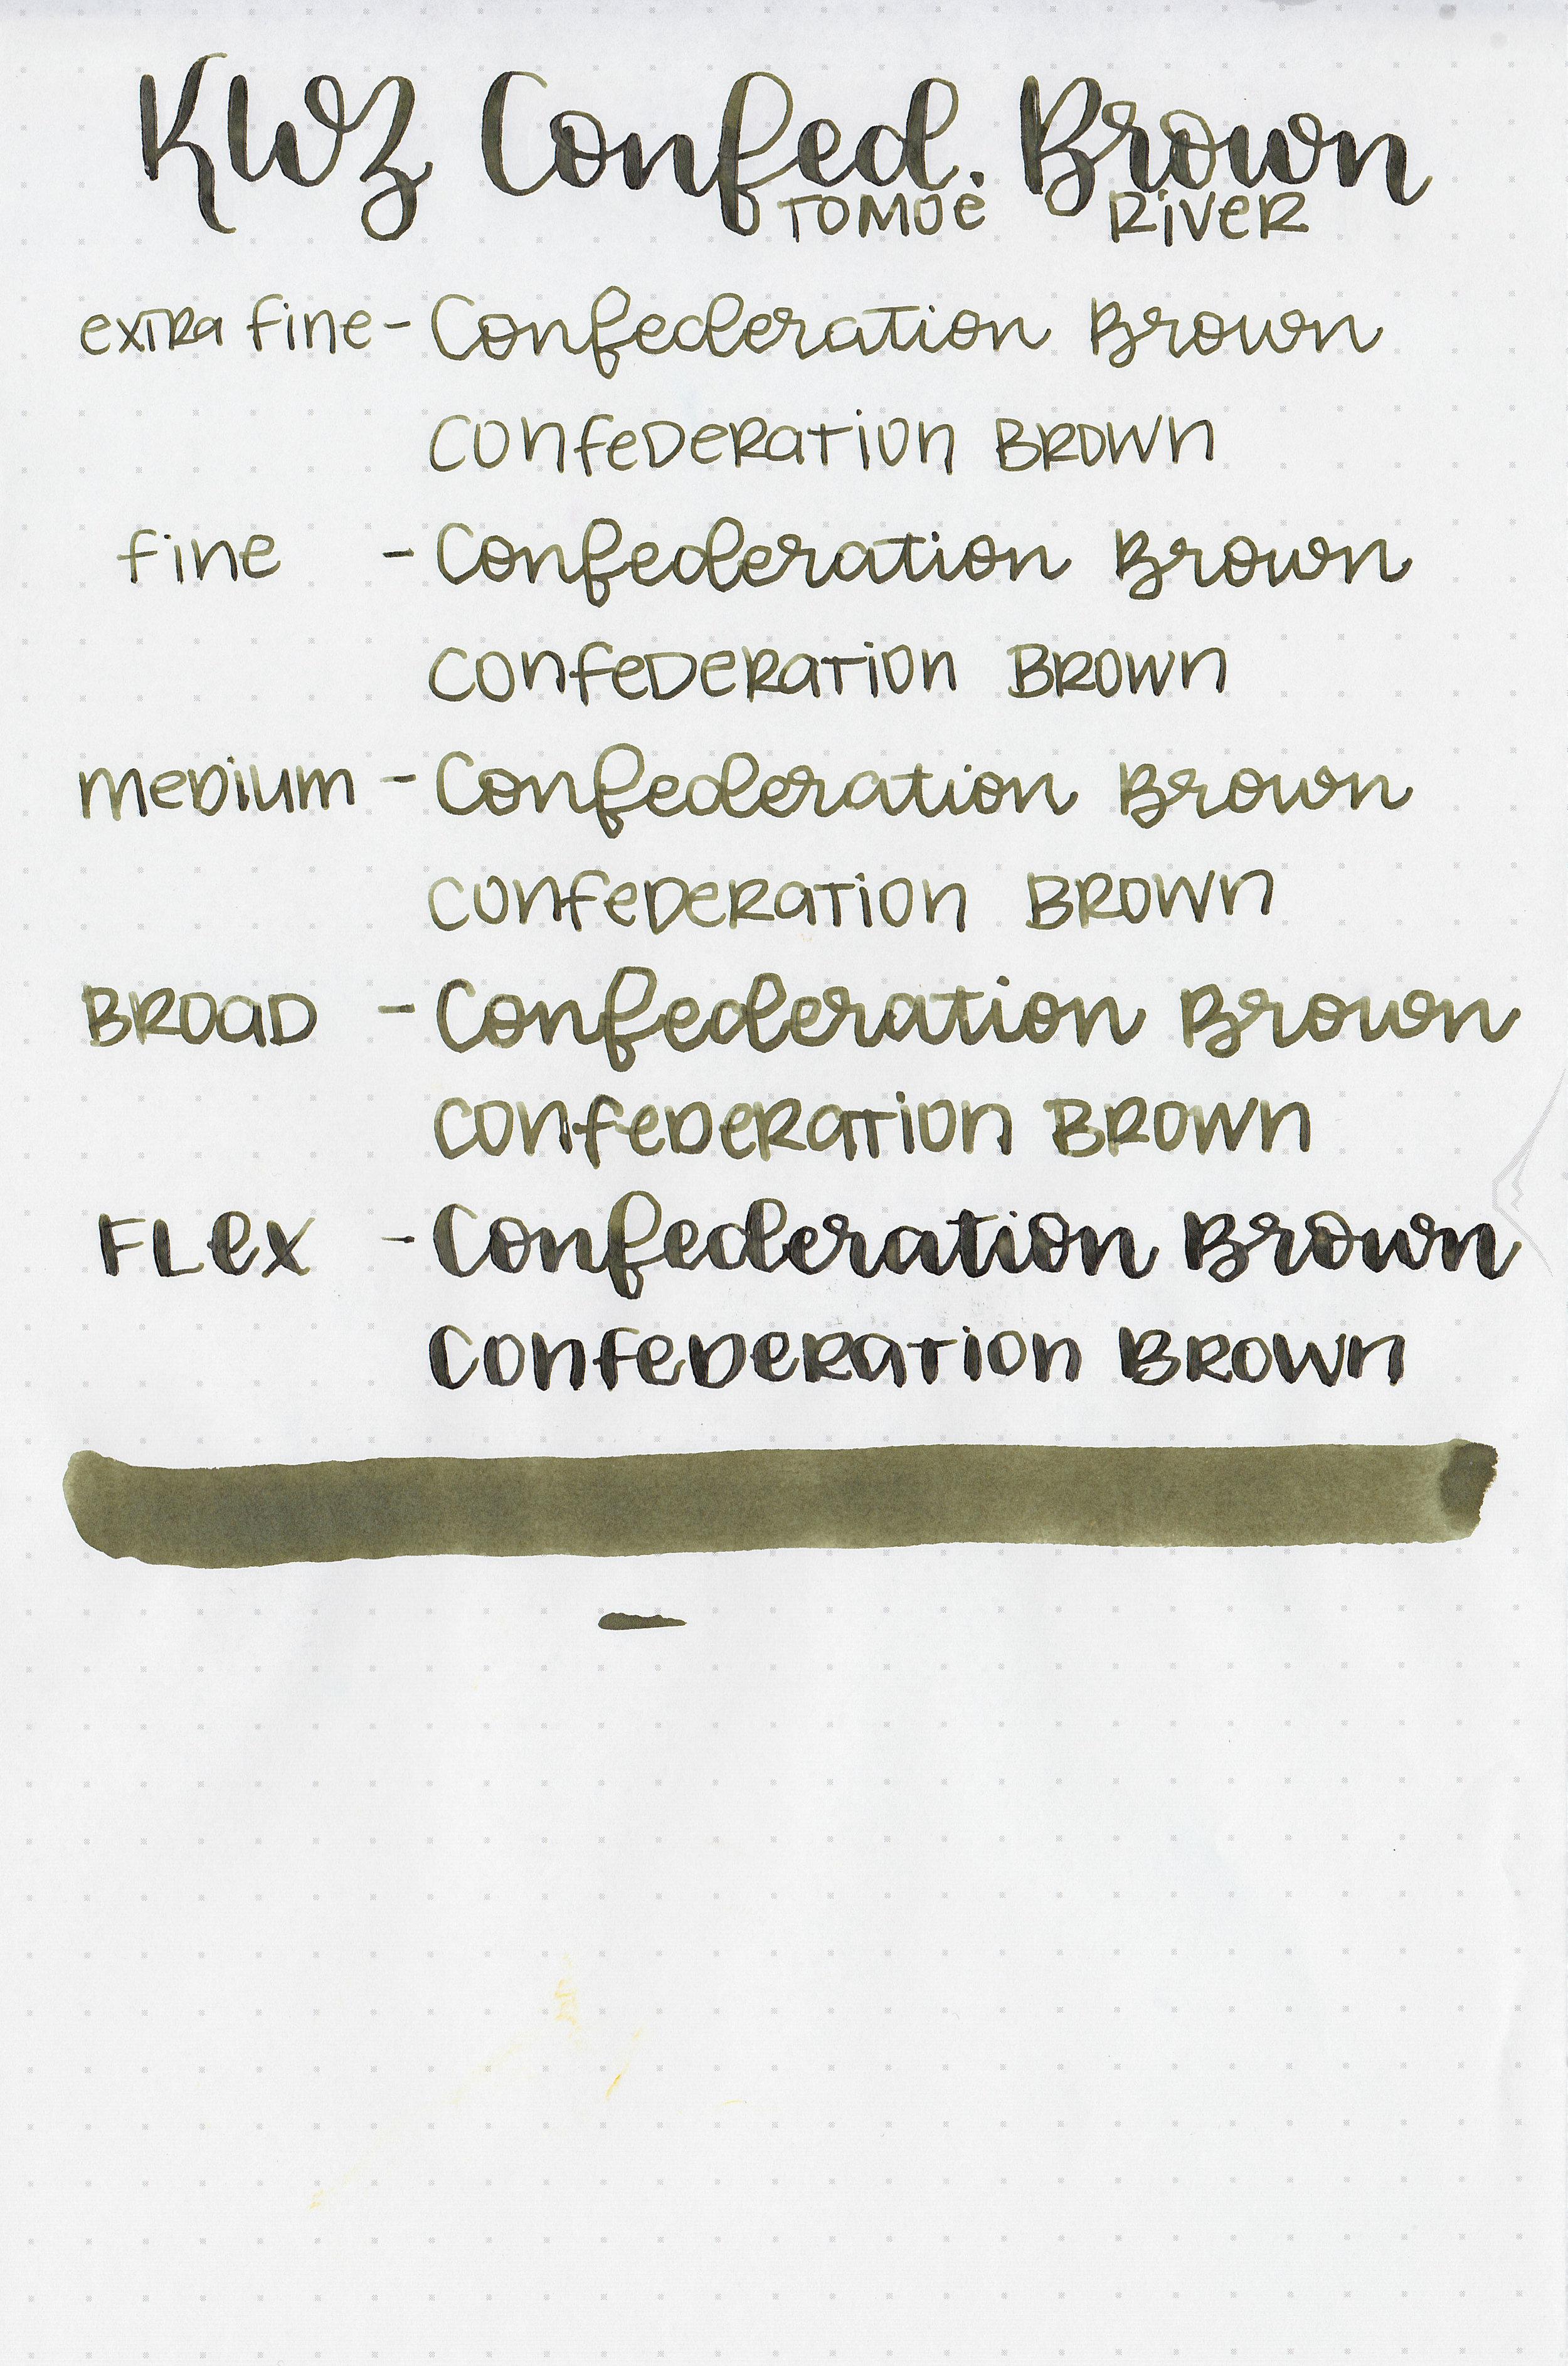 kwz-confederation-brown-6.jpg